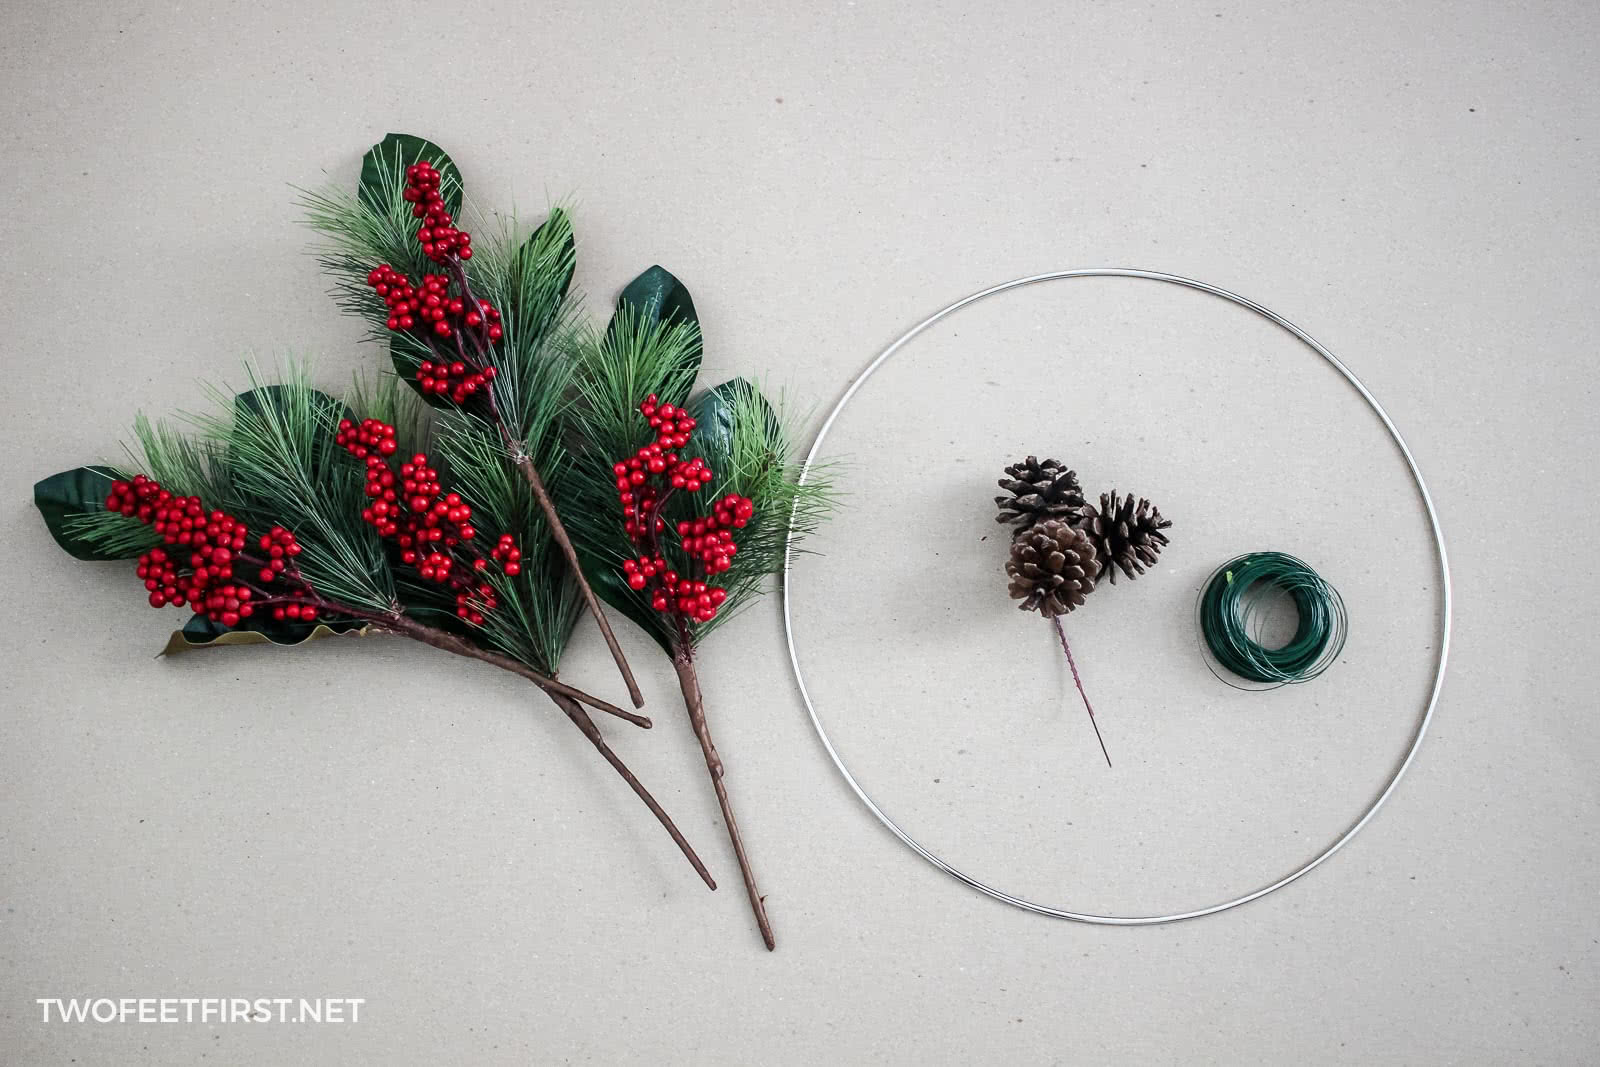 make a homemade Christmas wreath